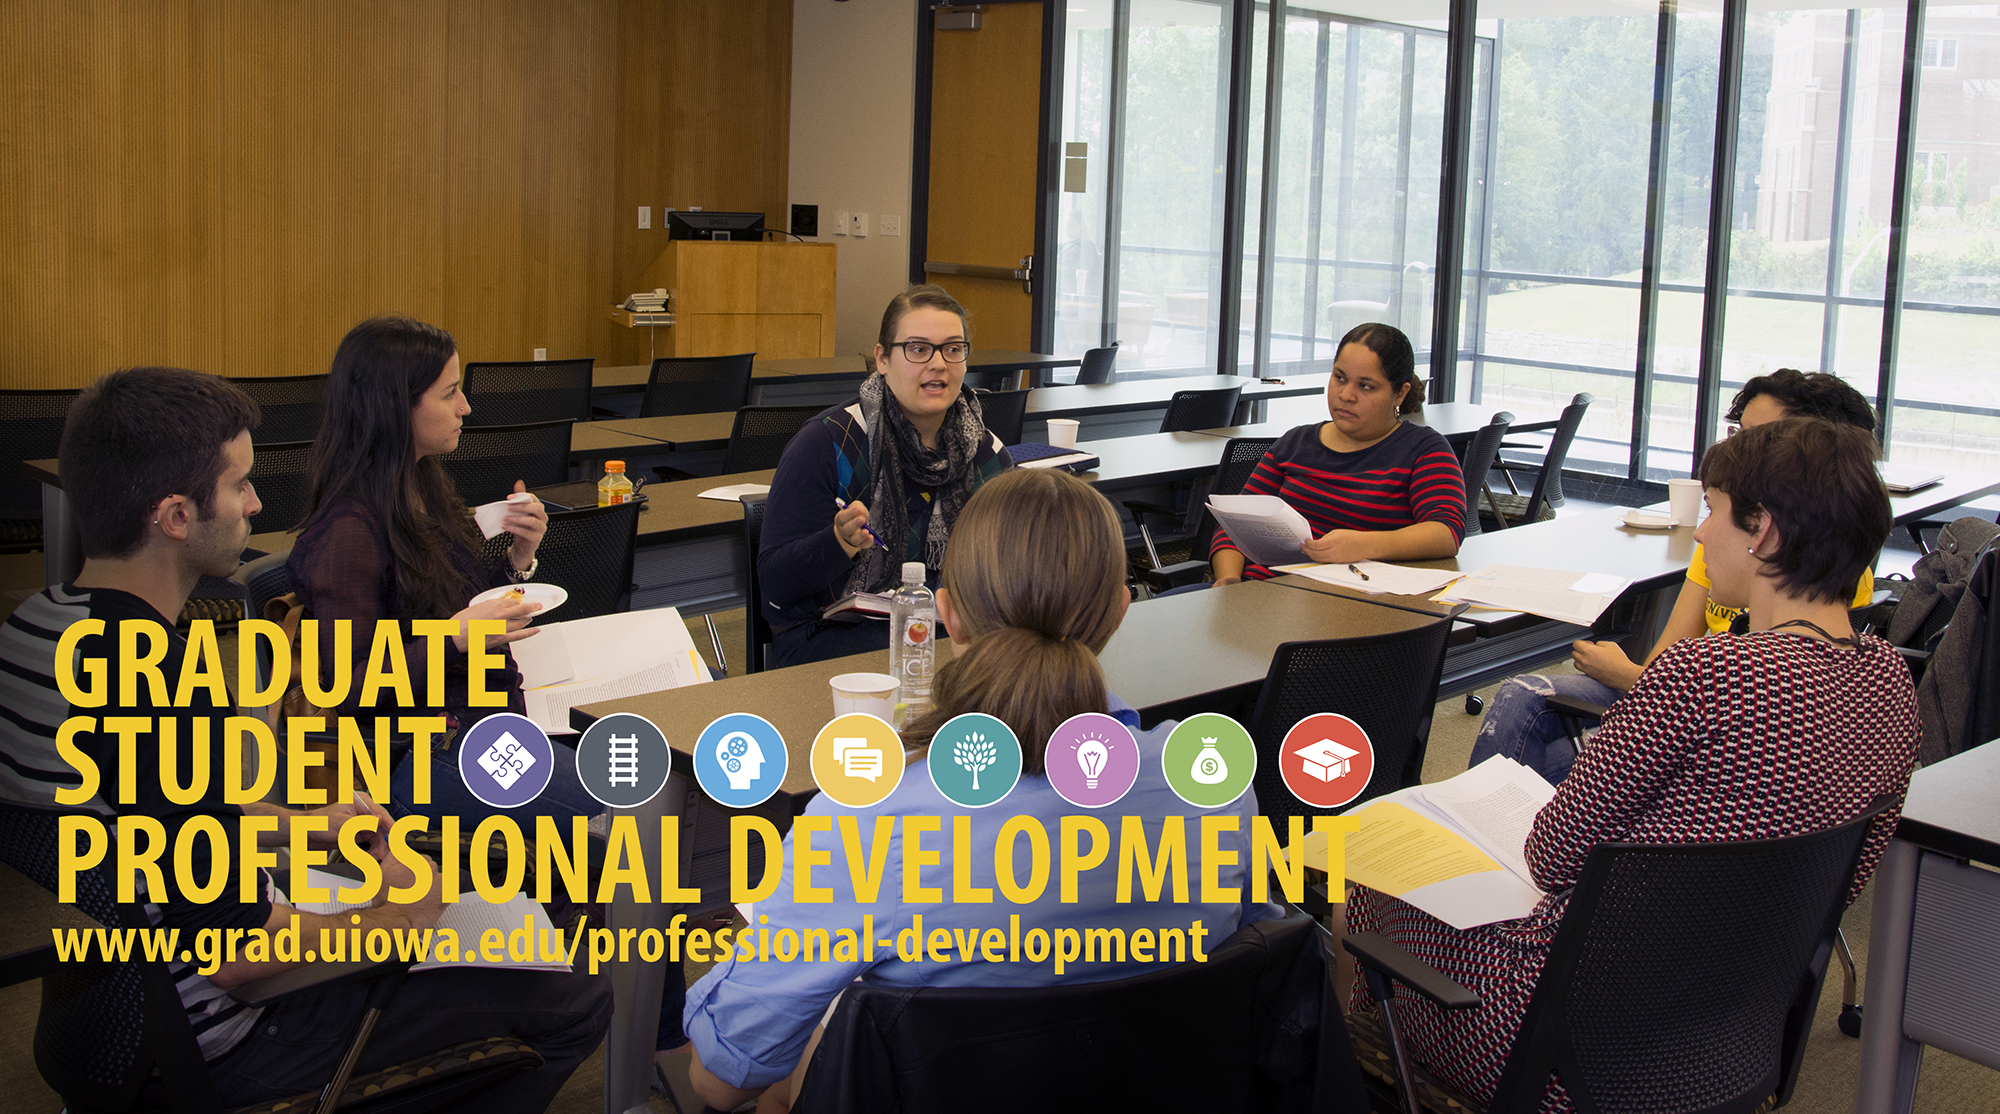 Graduate Student Professional Development